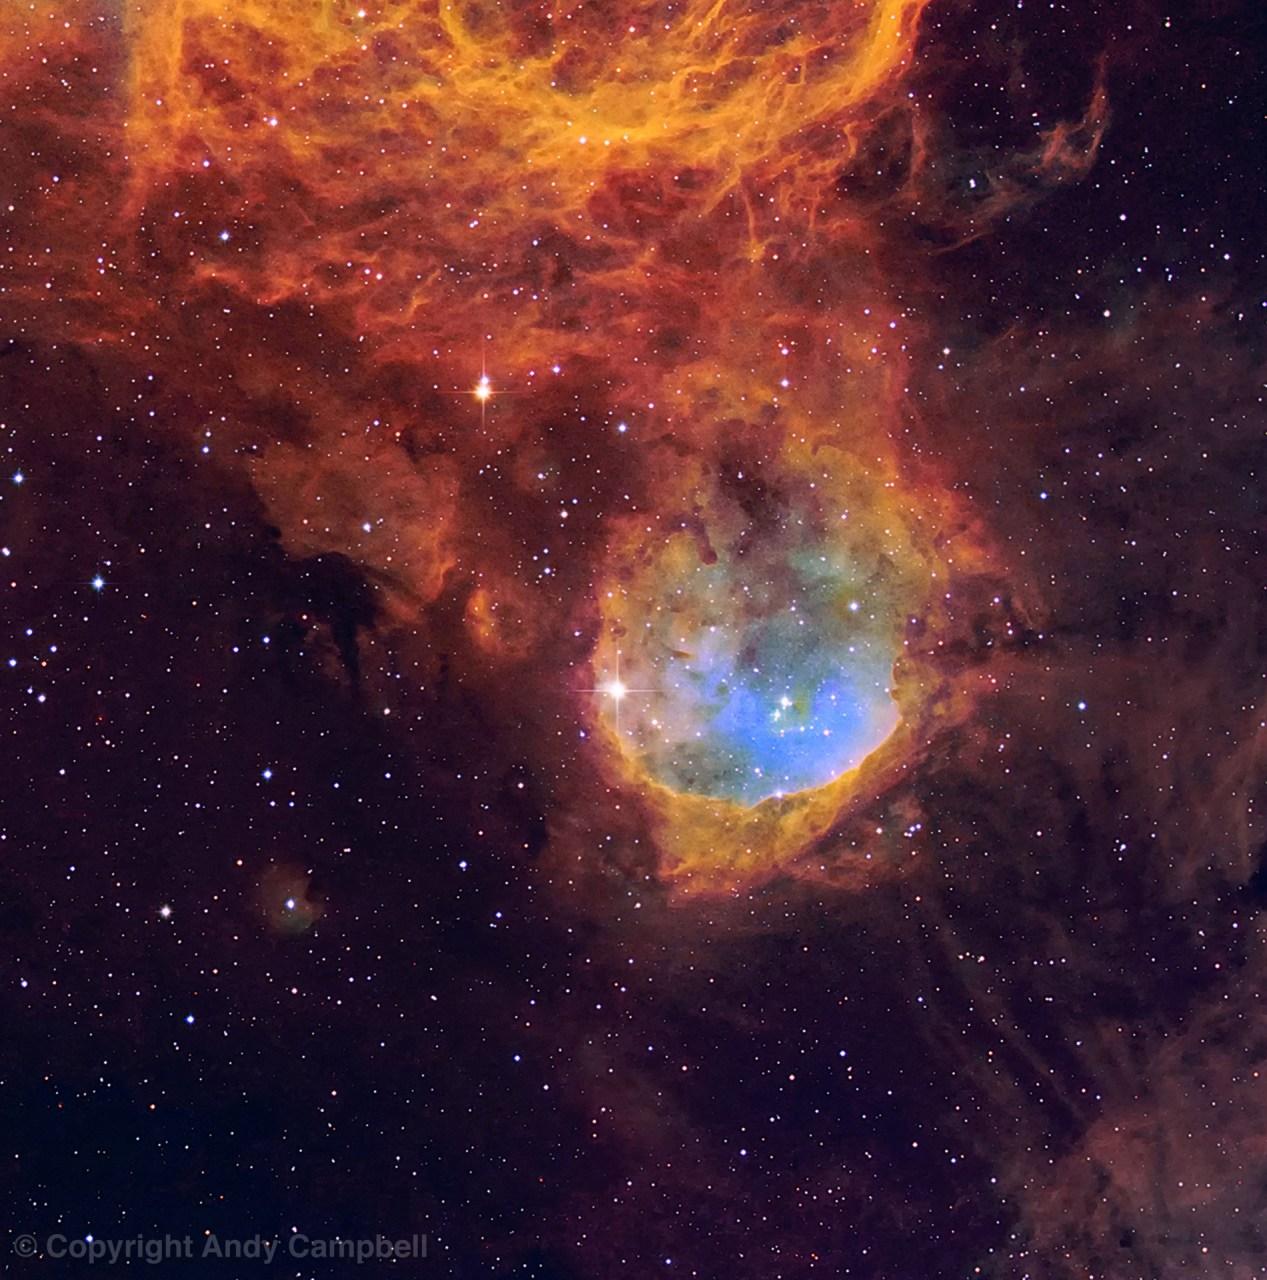 ngc 3324 Nebula narrowband image astrophotography